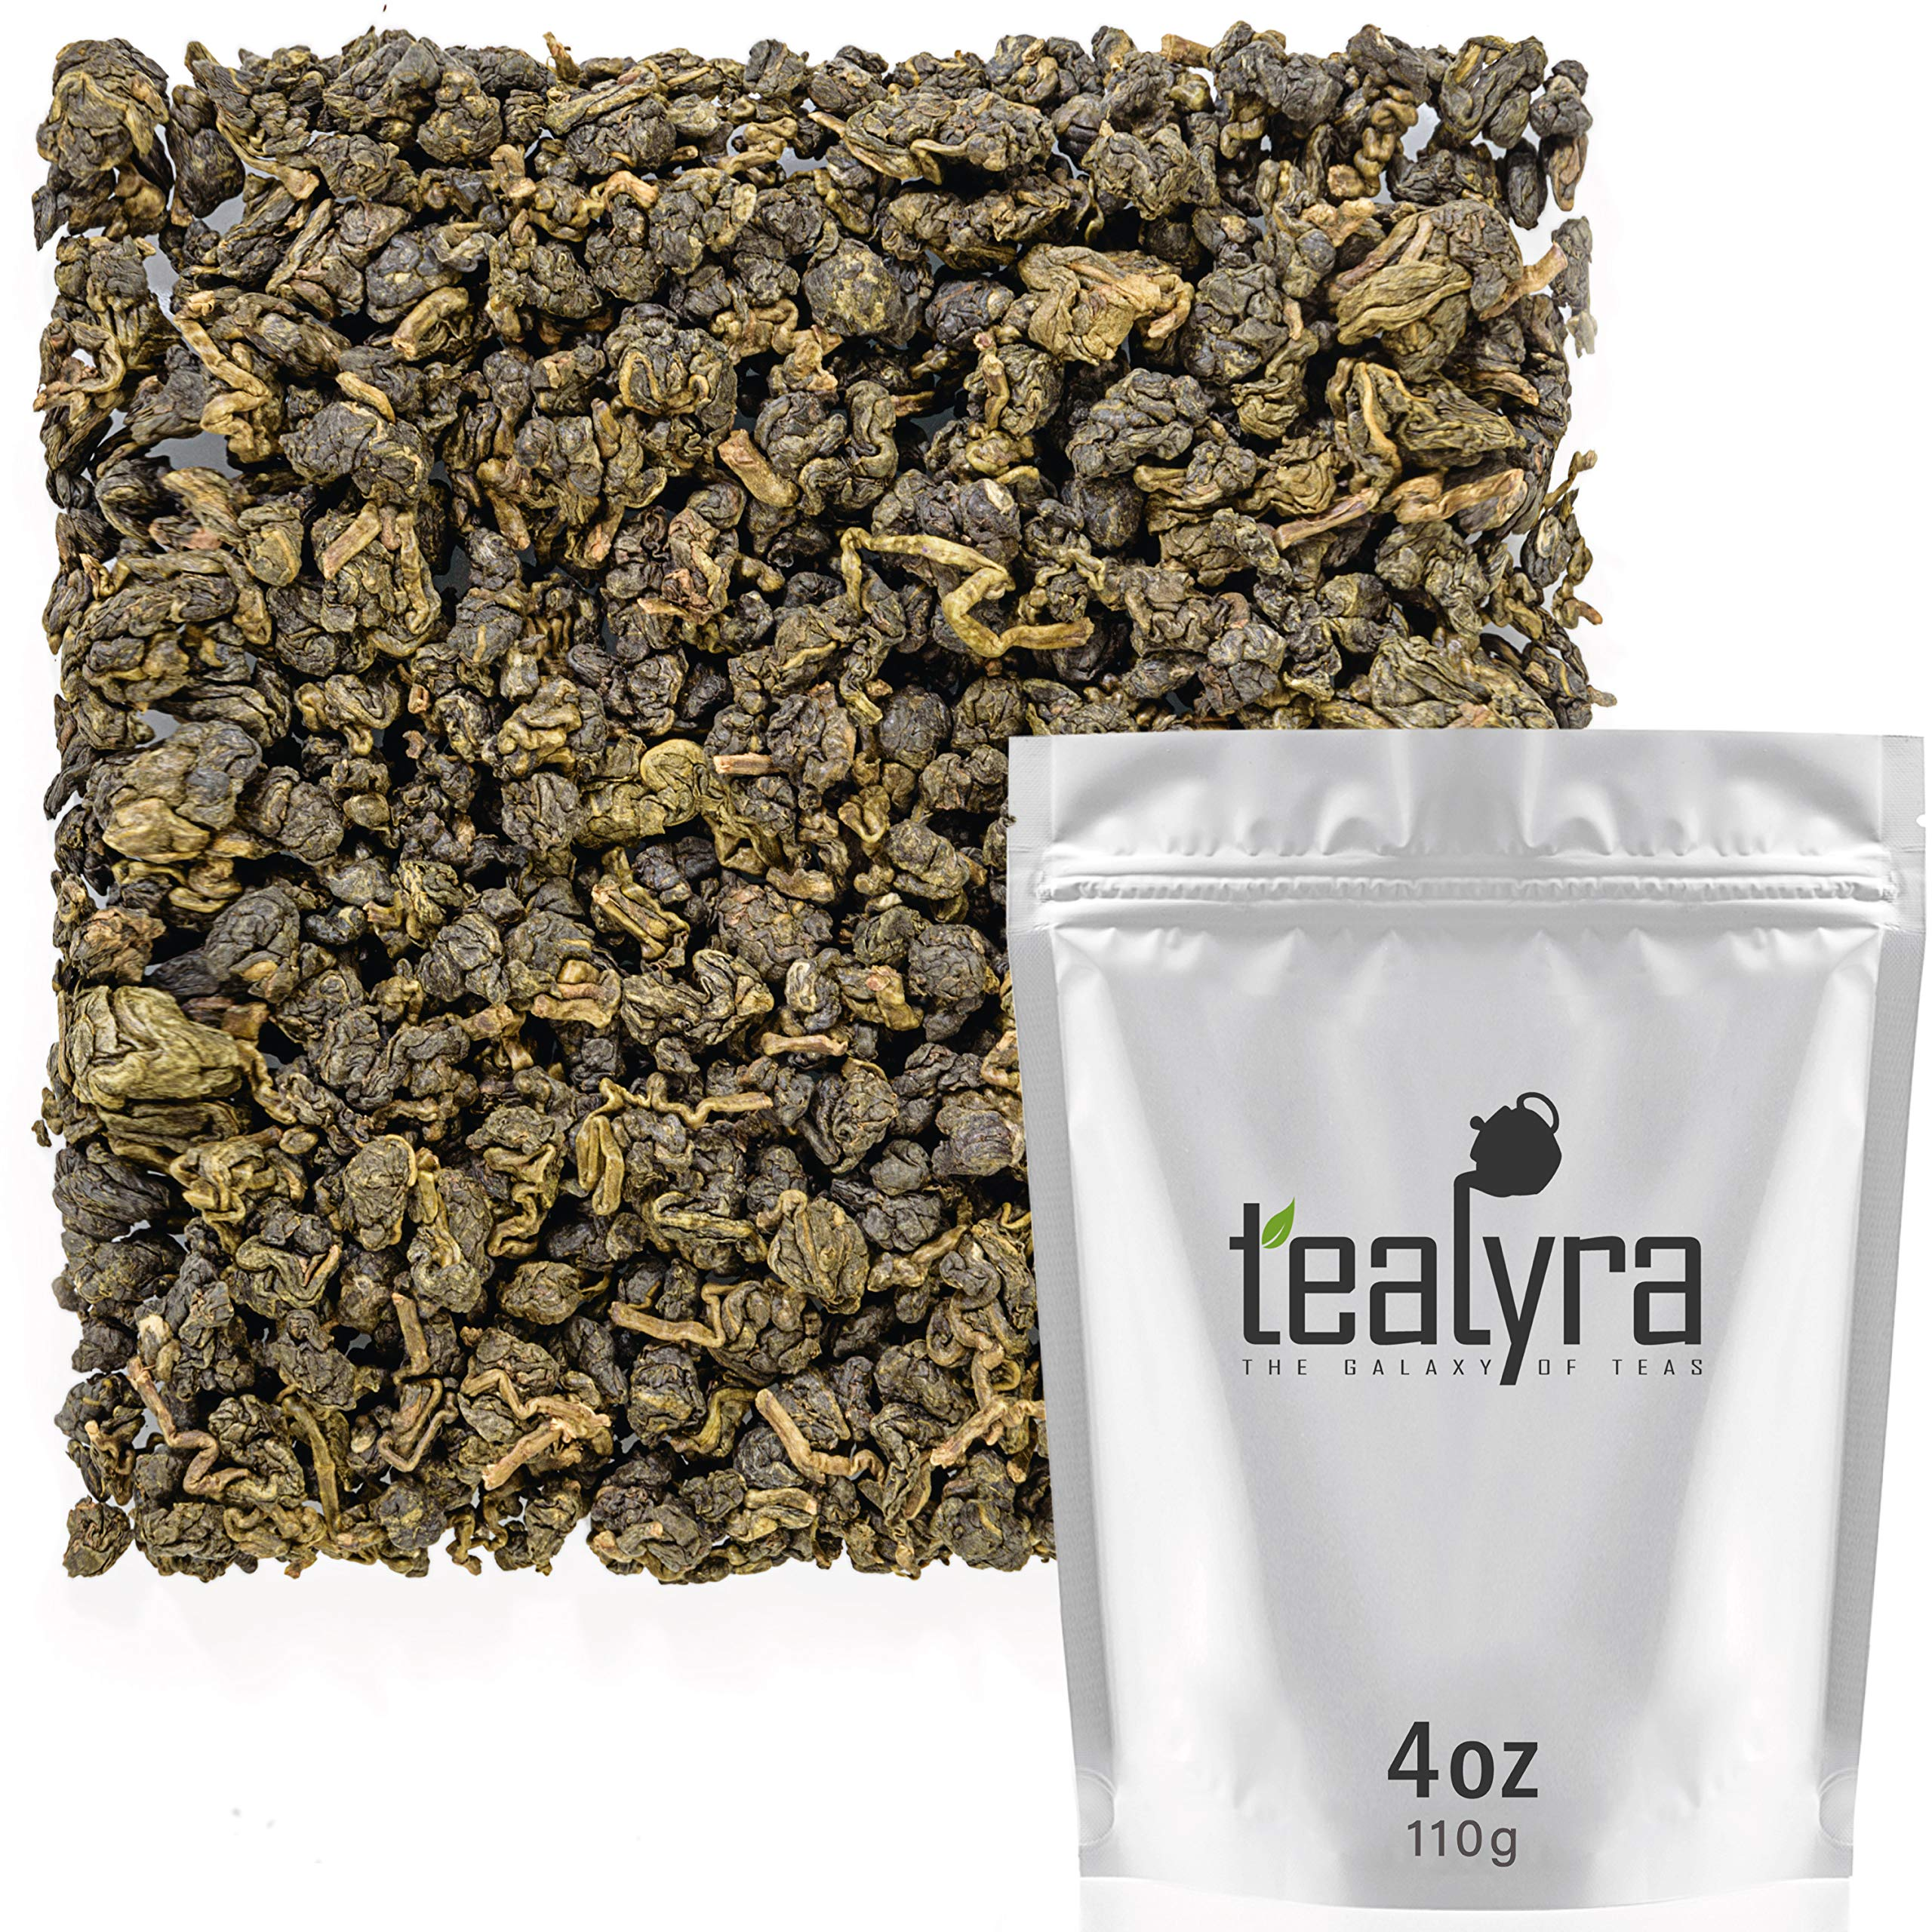 Tealyra - Ginseng Oolong Premium - Best Taiwanese Oolong - Loose Leaf Tea - Healthy - Digest and Energy Tea -Medium Caffeine - 110g (4-ounce) by Tealyra